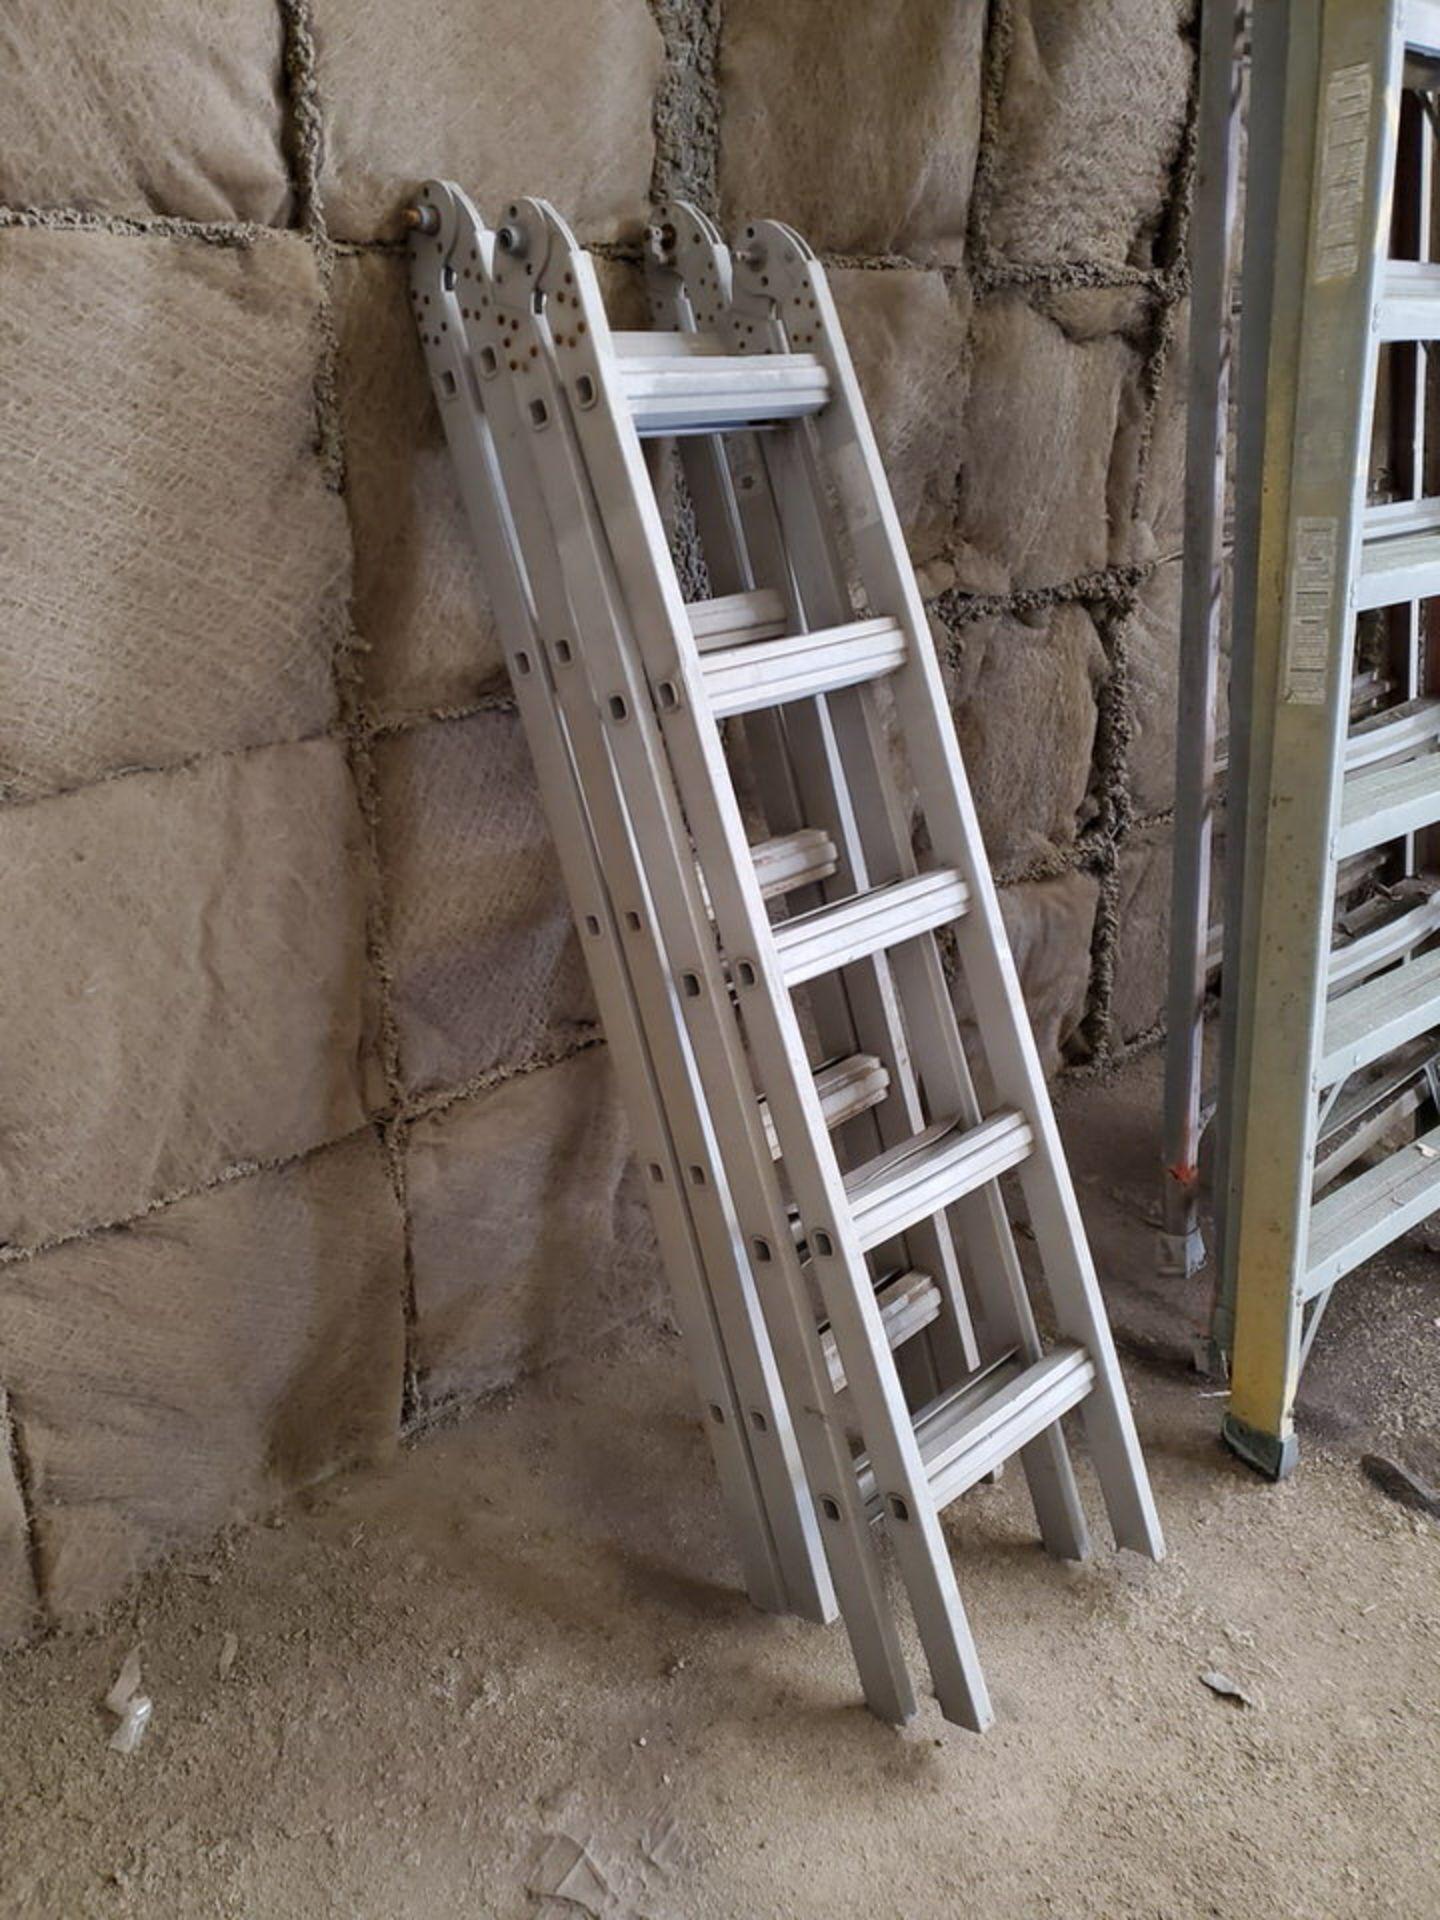 (4) Assorted Fiberglass Platform Ladders Sizes: (2) 4', (2) 14' - Image 4 of 4